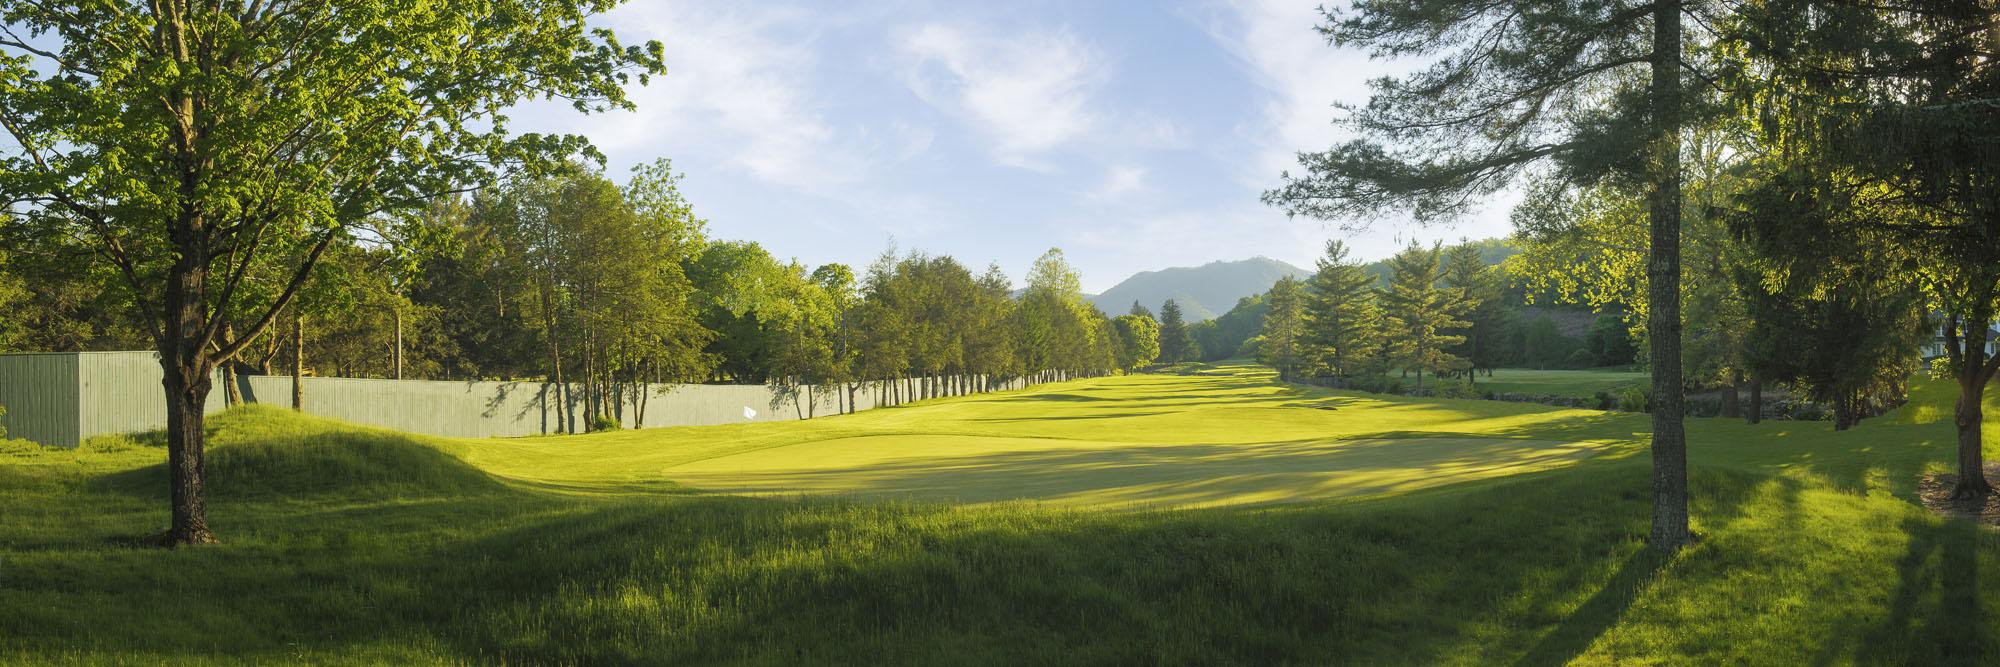 Golf Course Image - The Greenbrier Meadows Course No. 4